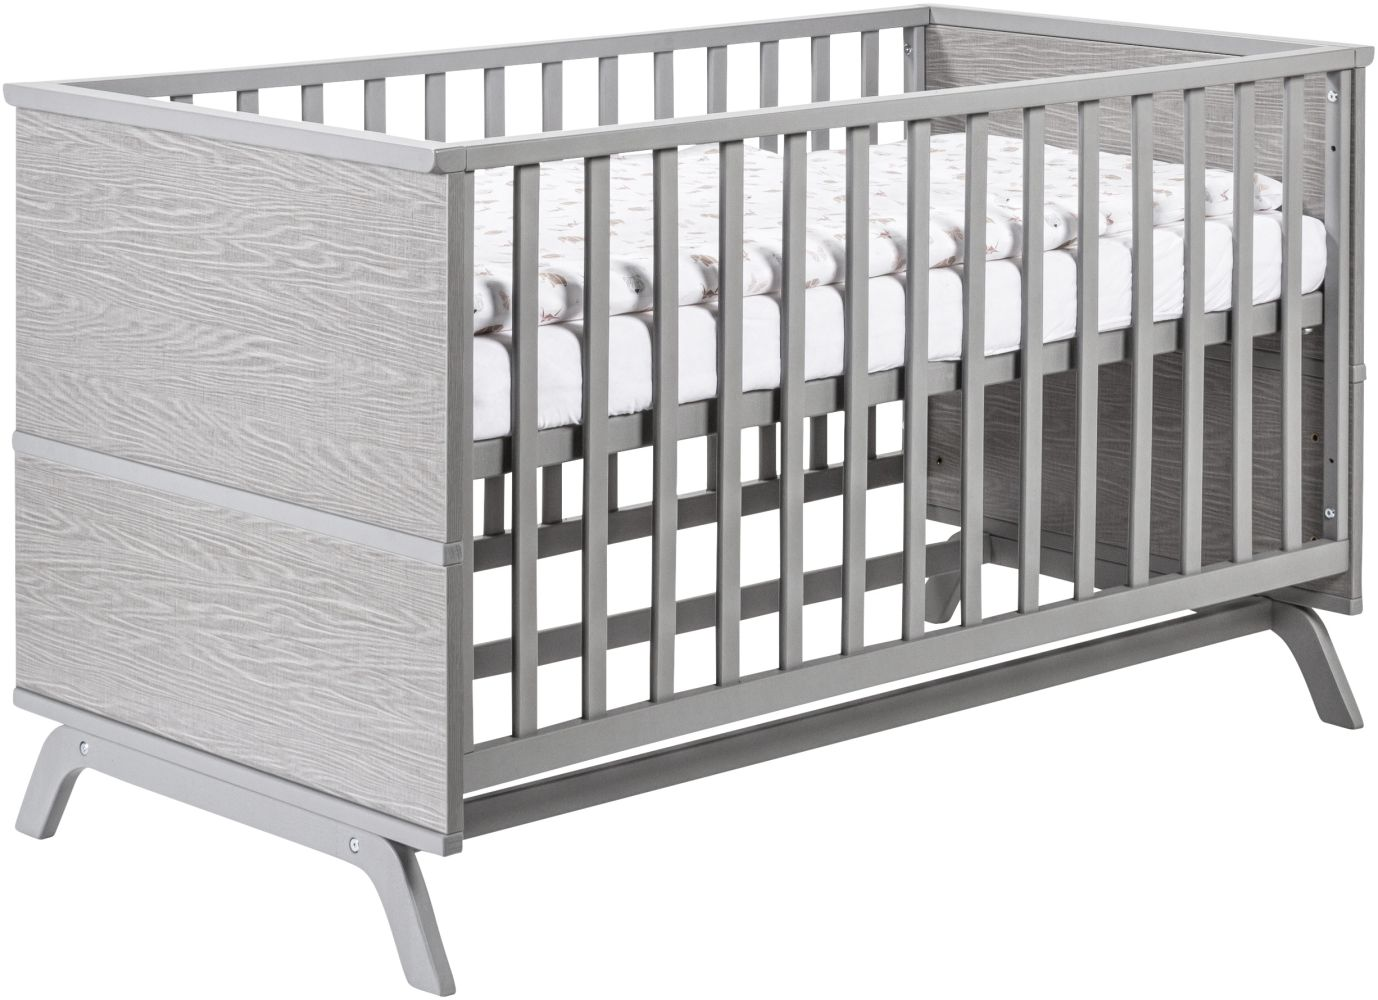 Schardt 'Vicky' Kombi-Kinderbett grau Bild 1